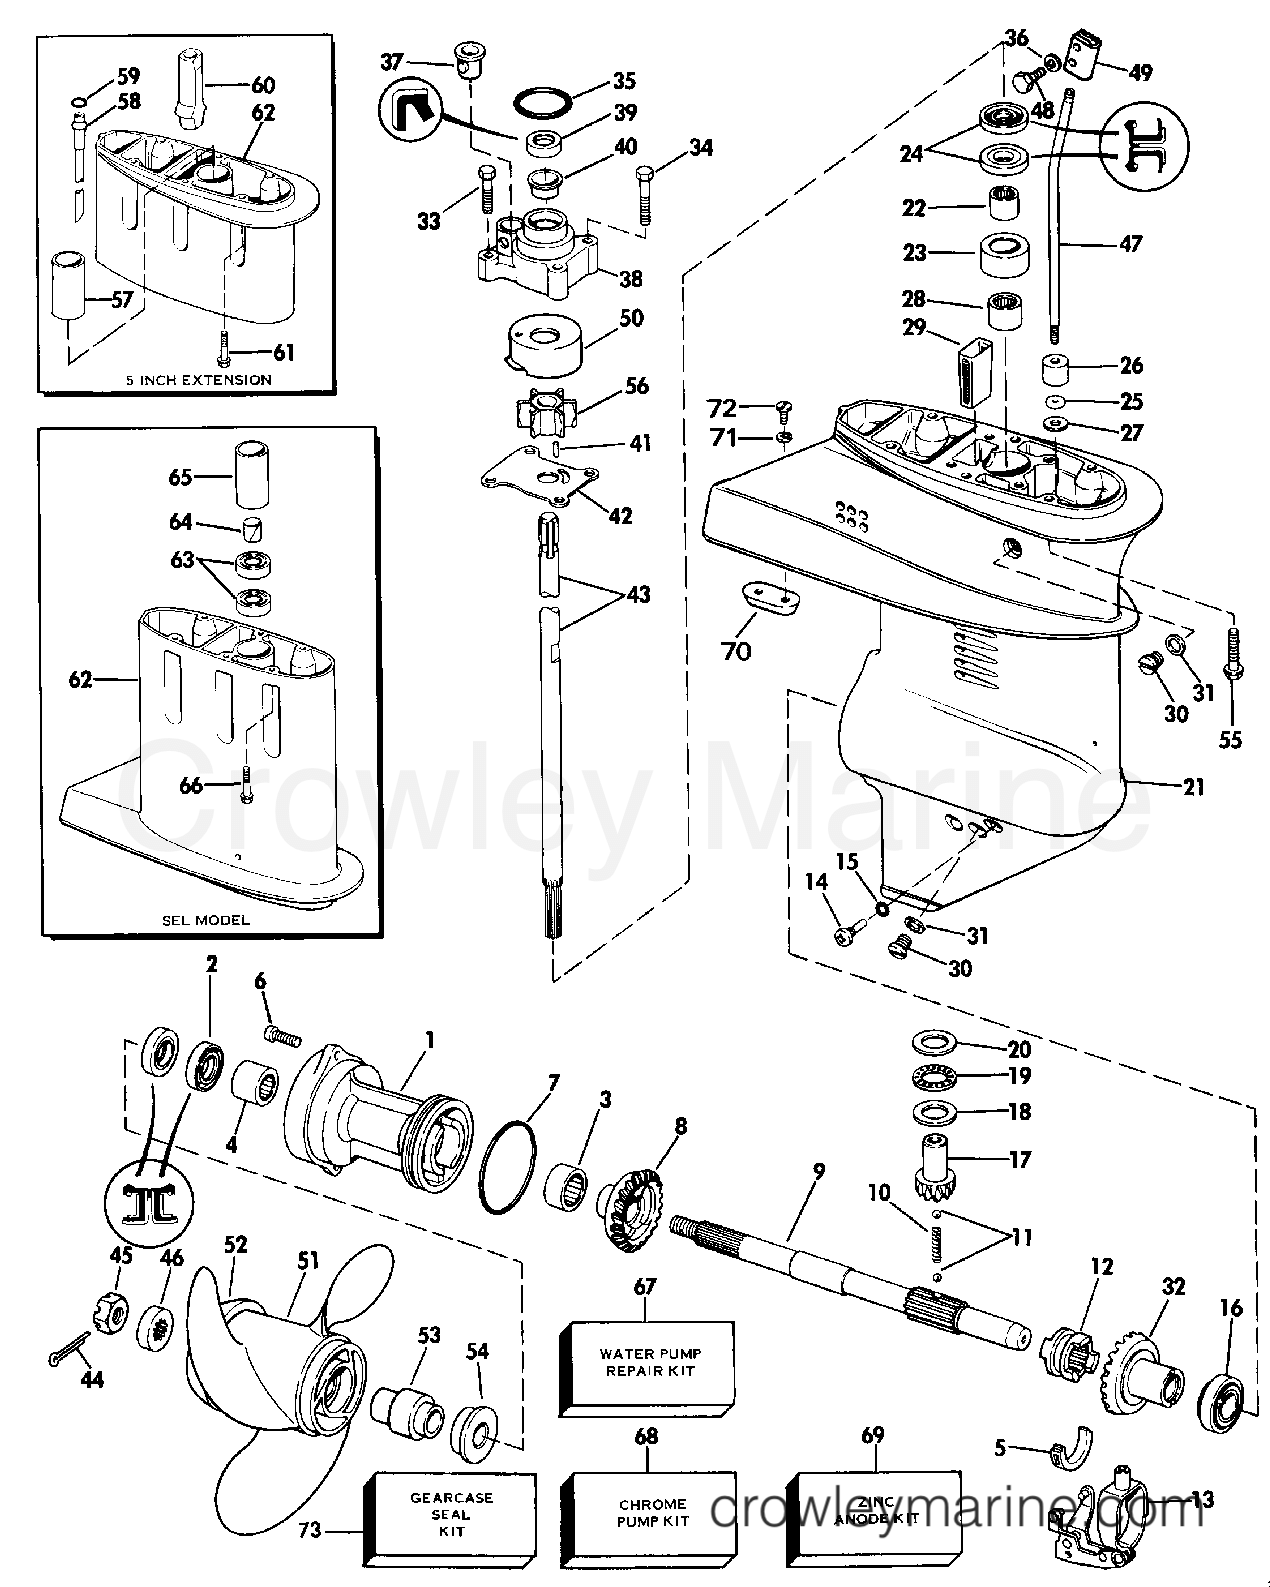 1986 Evinrude Outboards 9.9 - E10ECDB GEARCASE section